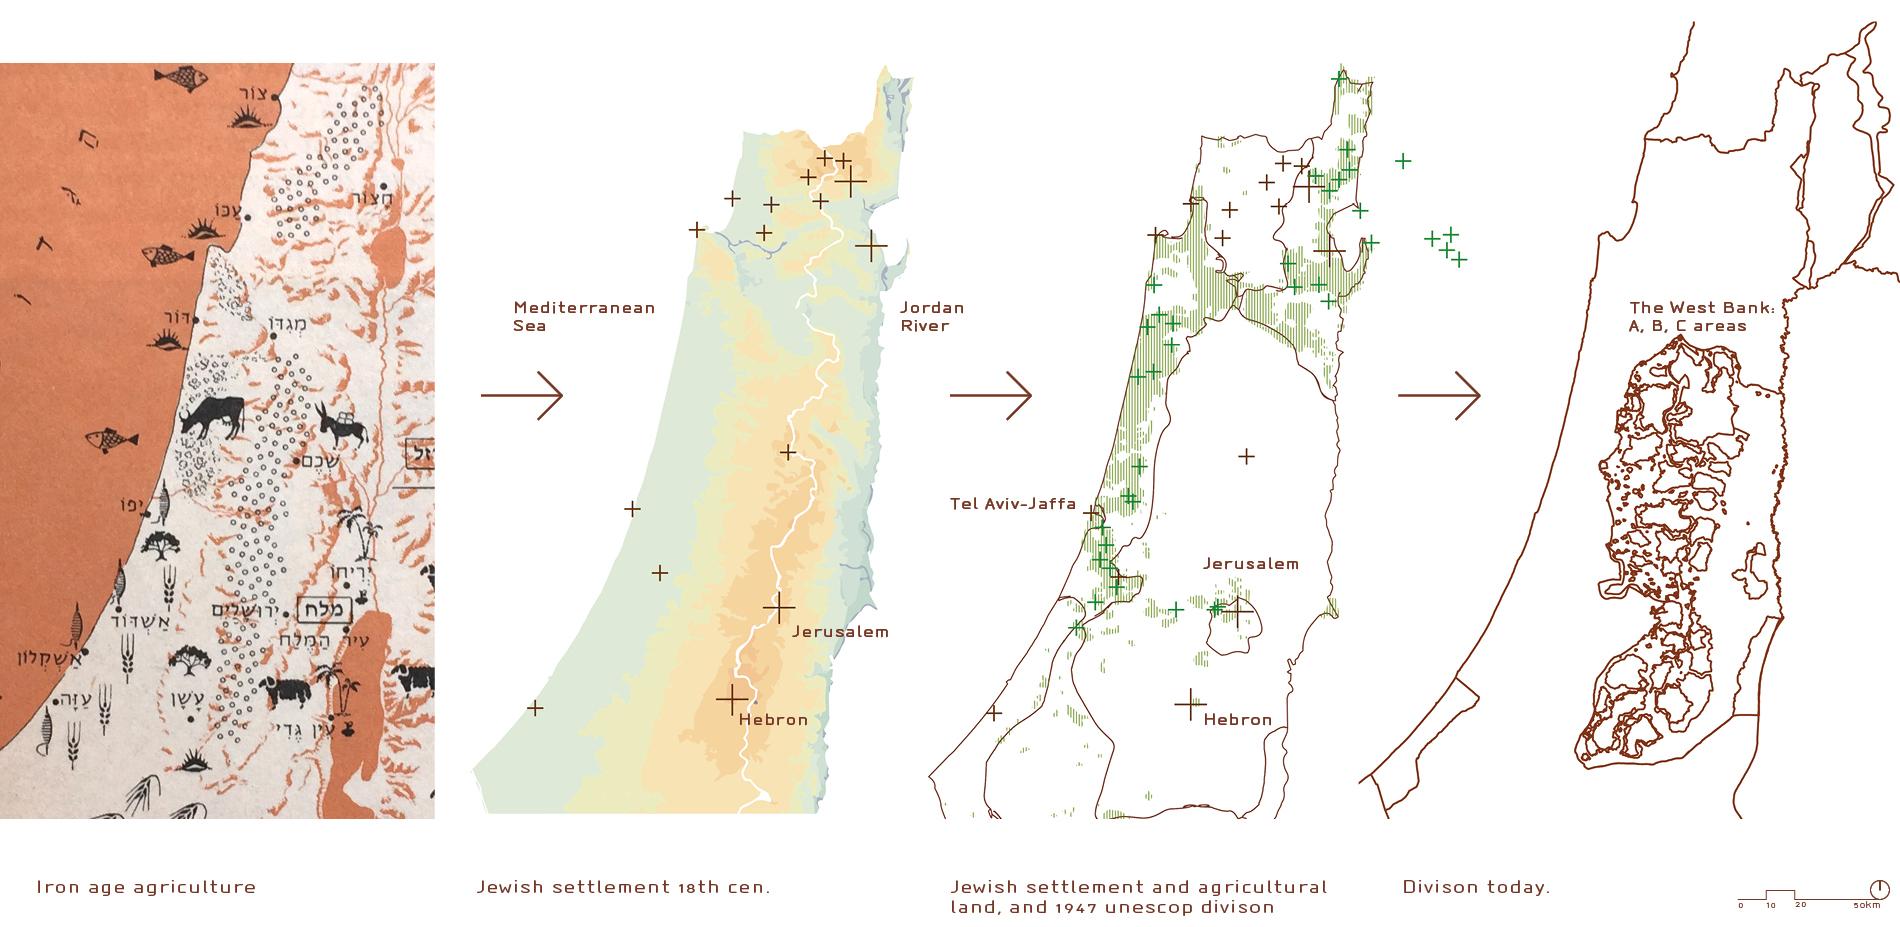 1.1. Geopolitical landscape - historical background - settlement by landscape.